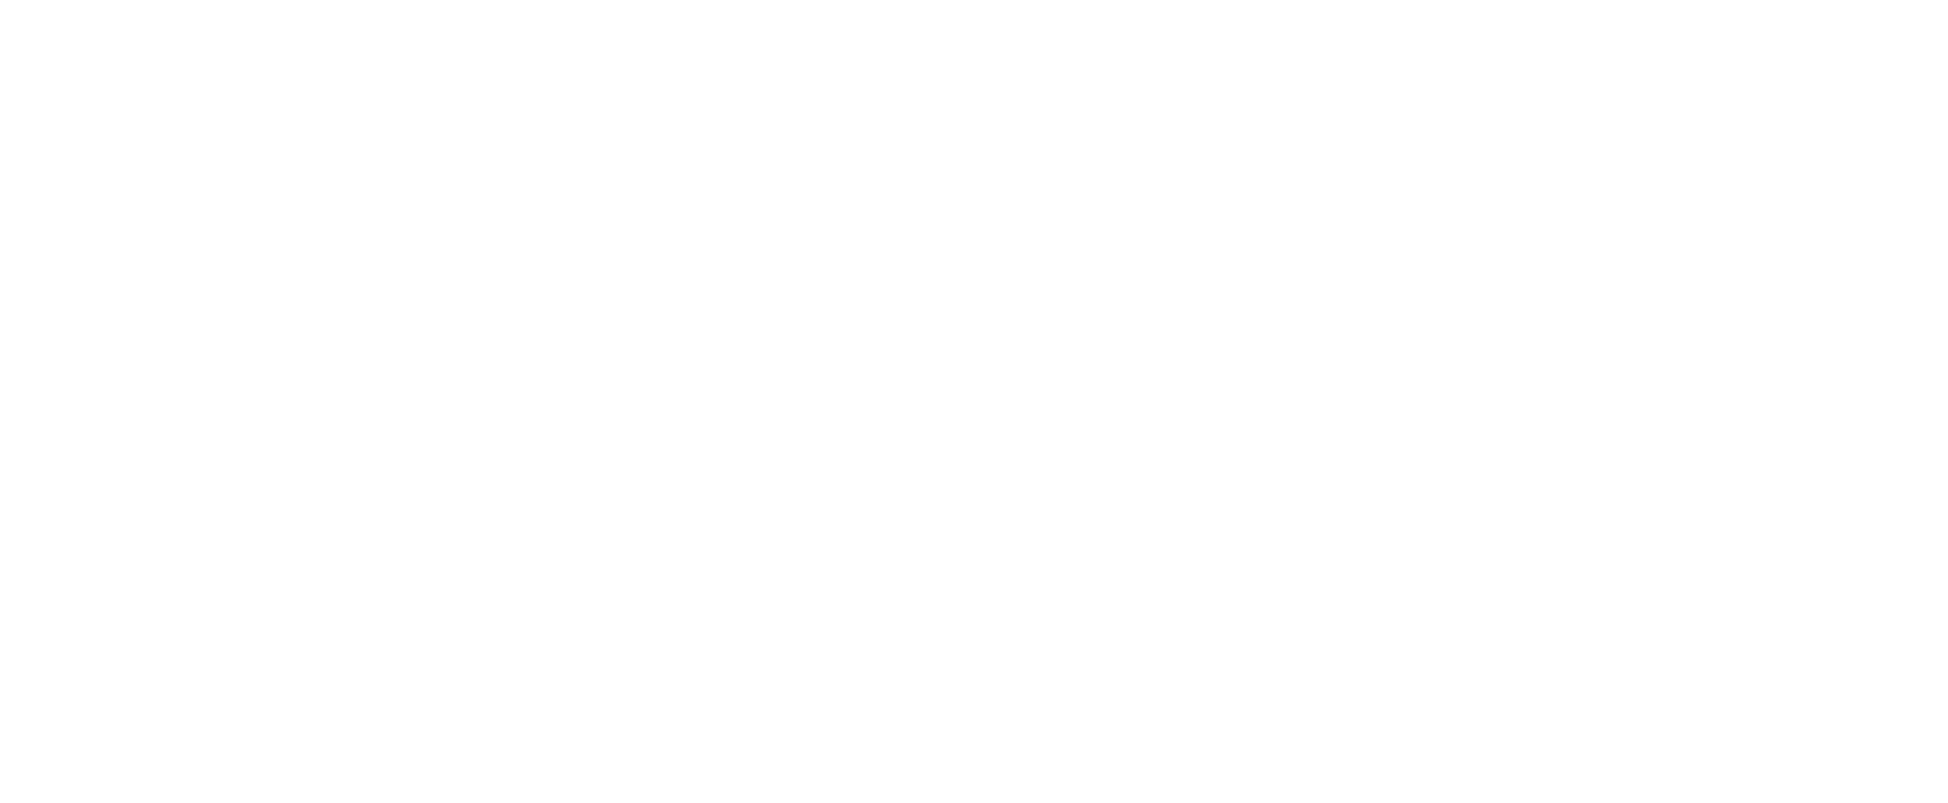 cropped-Tatsu-White.png